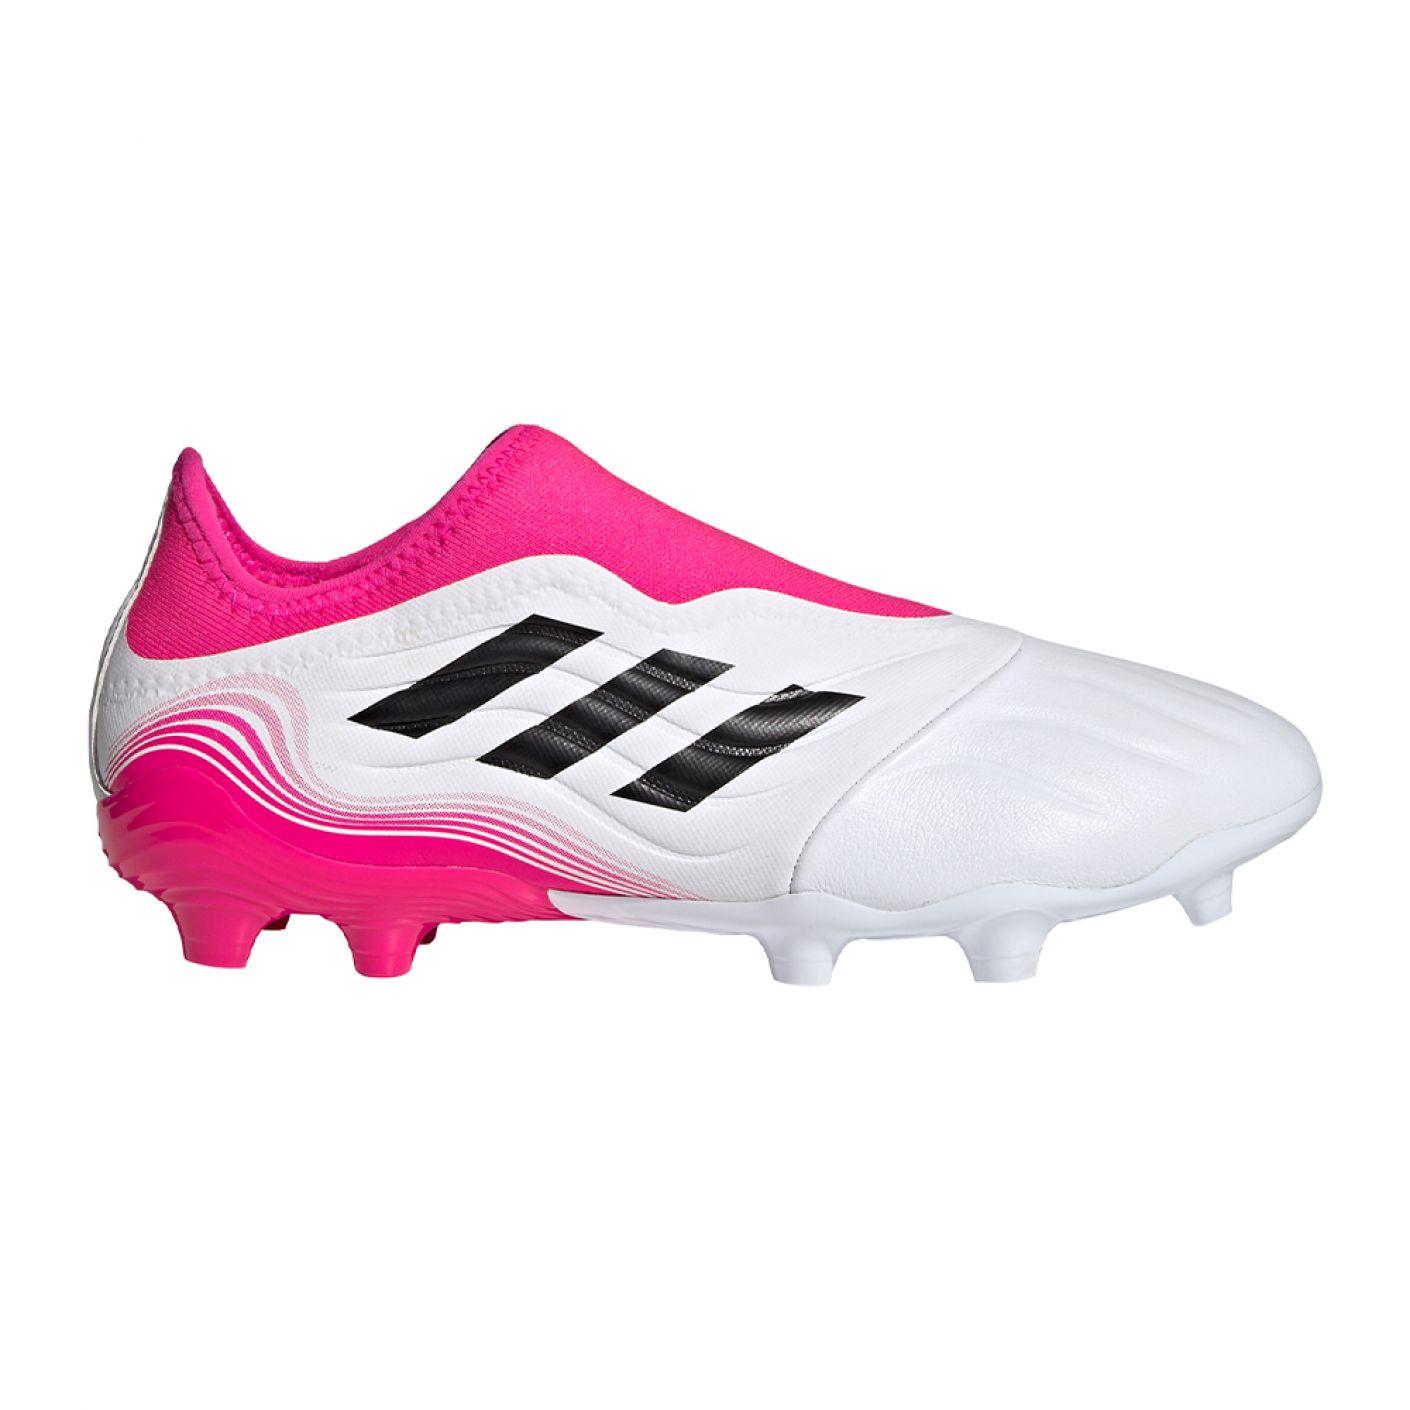 adidas Copa Sense.3 LL Gras Voetbalschoenen (FG) Wit Zwart Roze